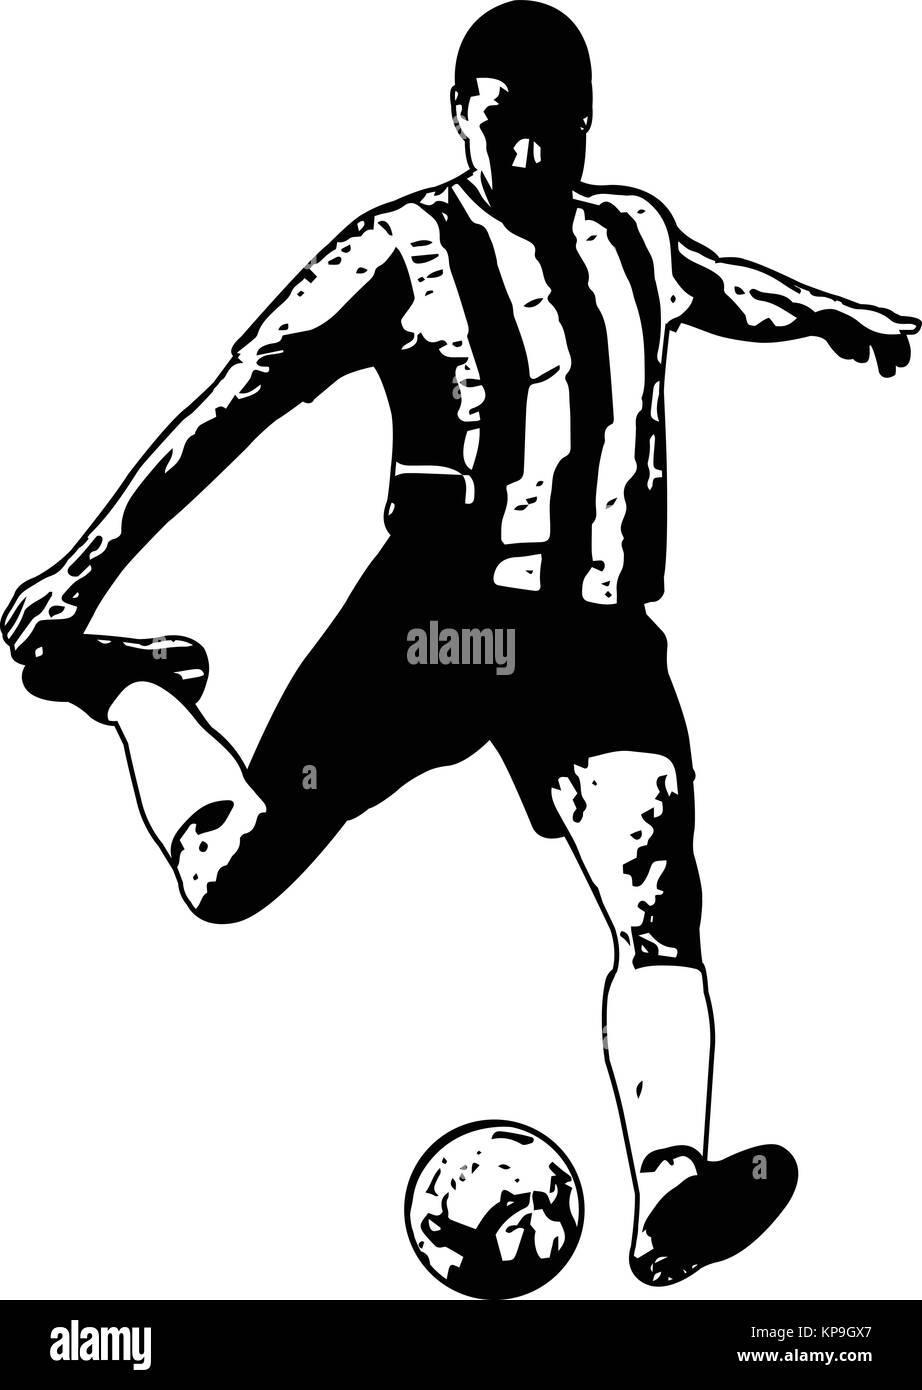 soccer player sketch illustration - vector - Stock Vector